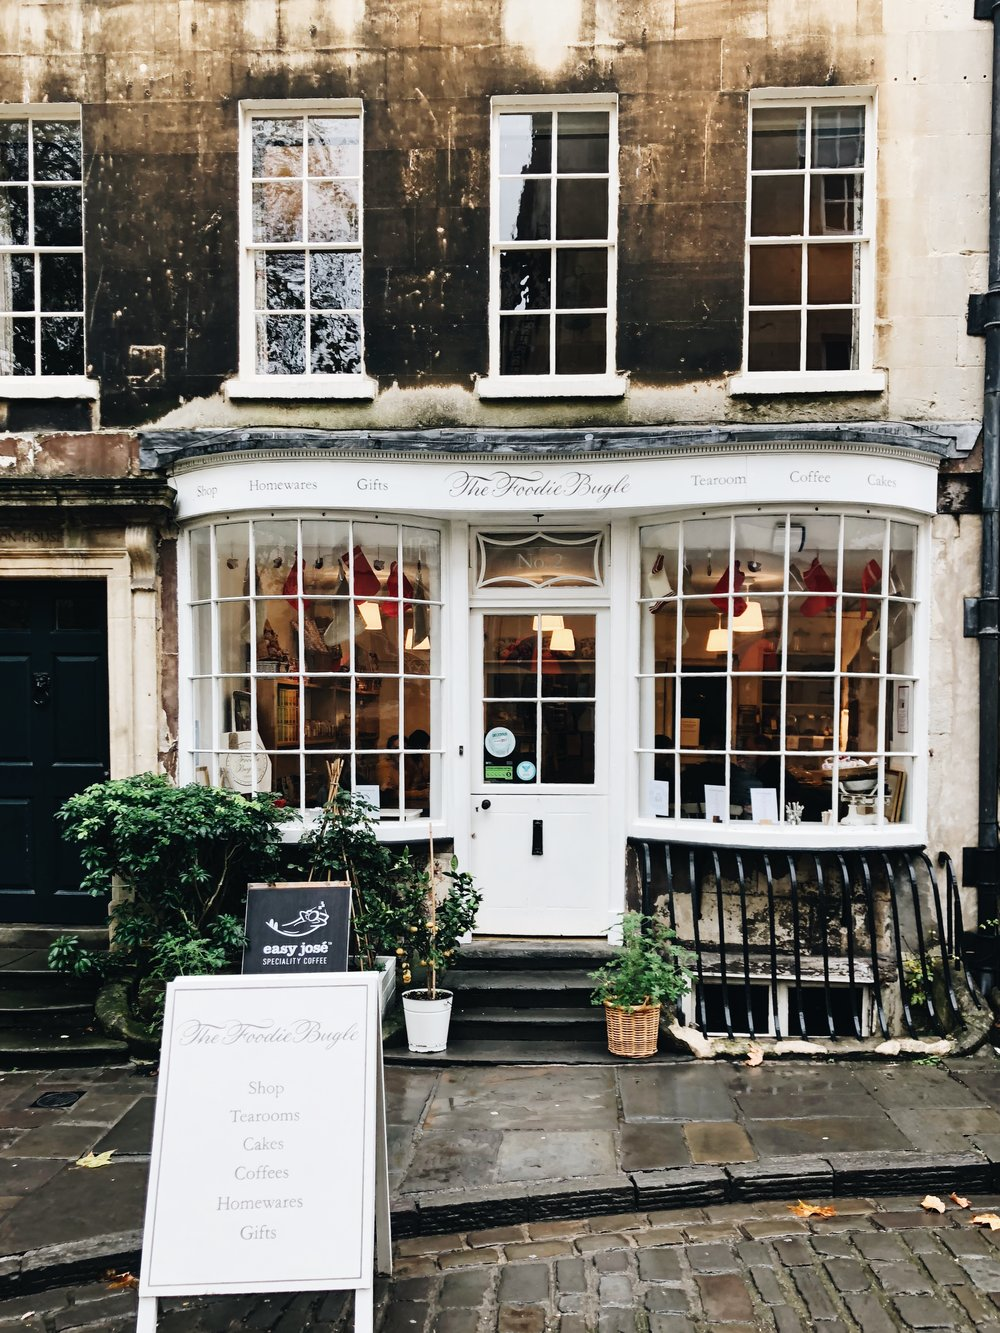 Foodie Bugle Shop | Bath, England | Sea of Atlas